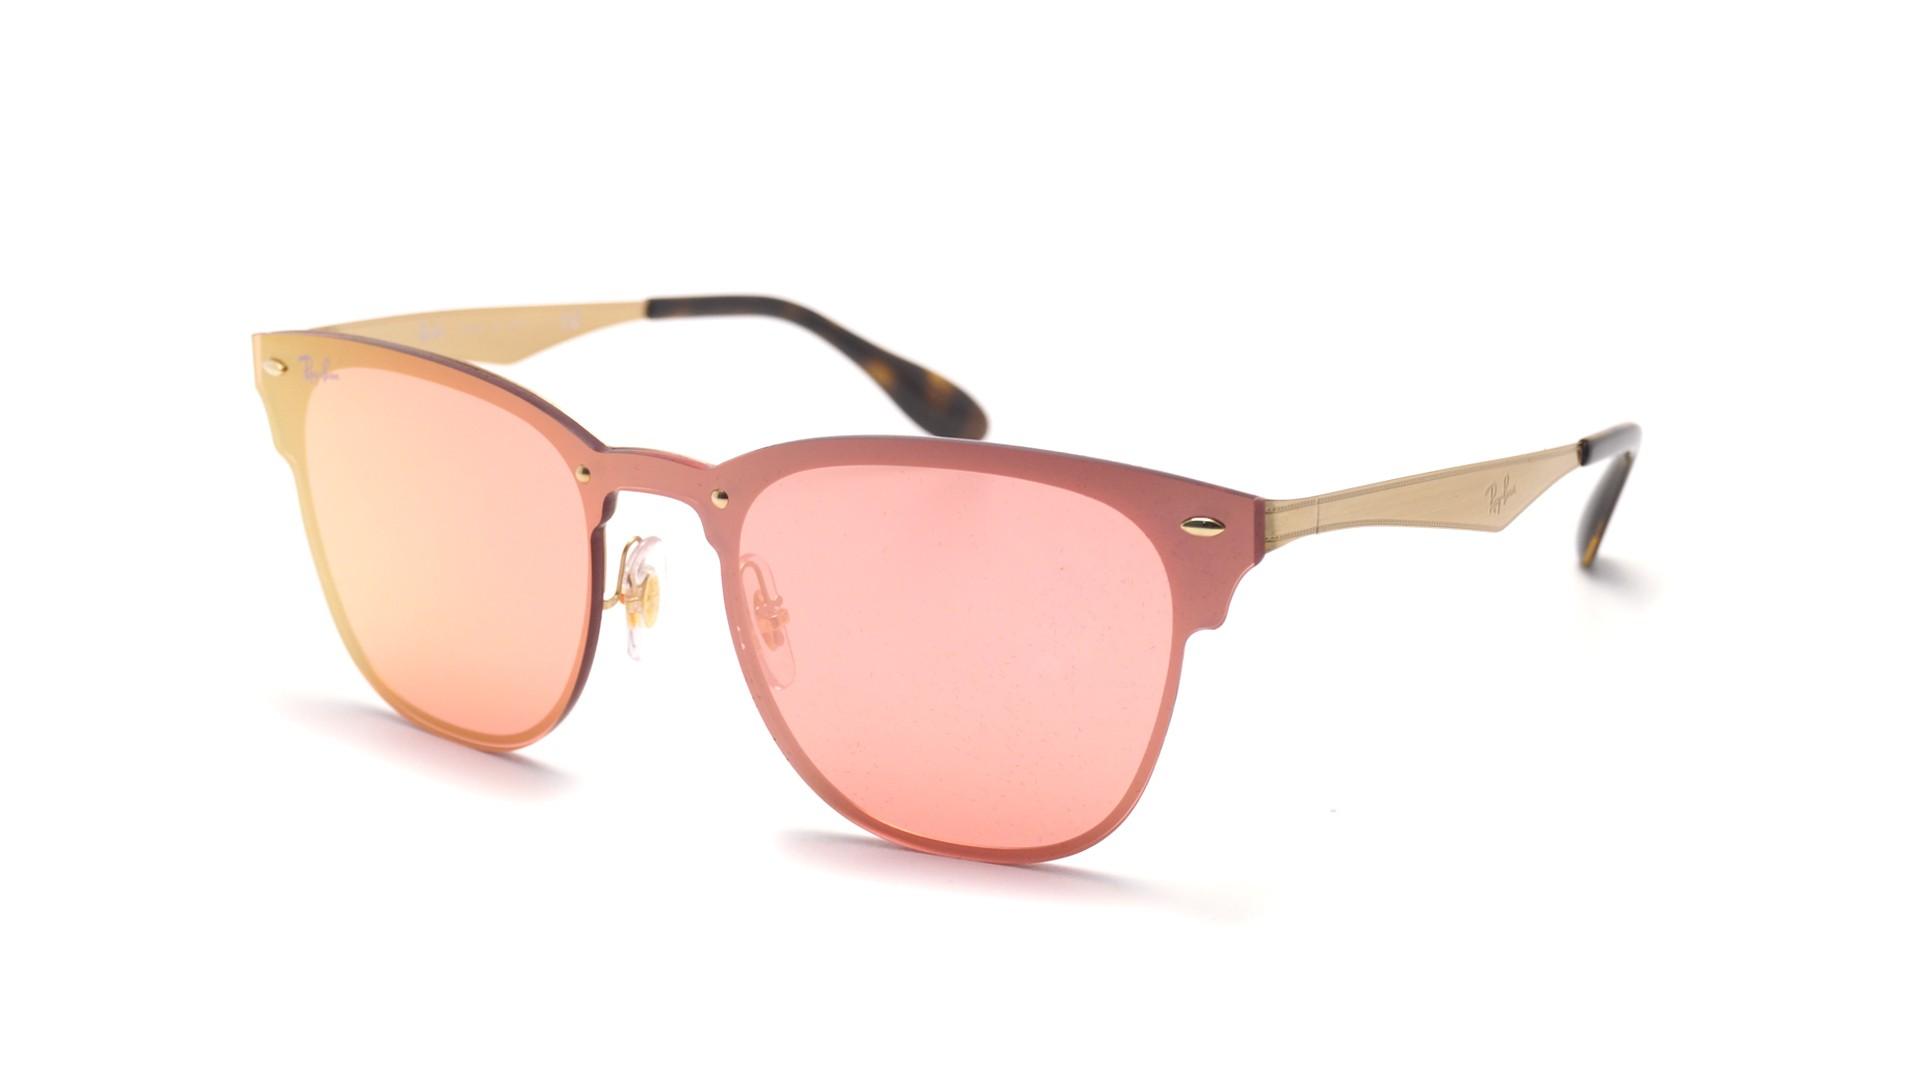 c4cdb0d666552 Sunglasses Ray-Ban Clubmaster Blaze Gold RB3576N 043 E4 Medium Mirror